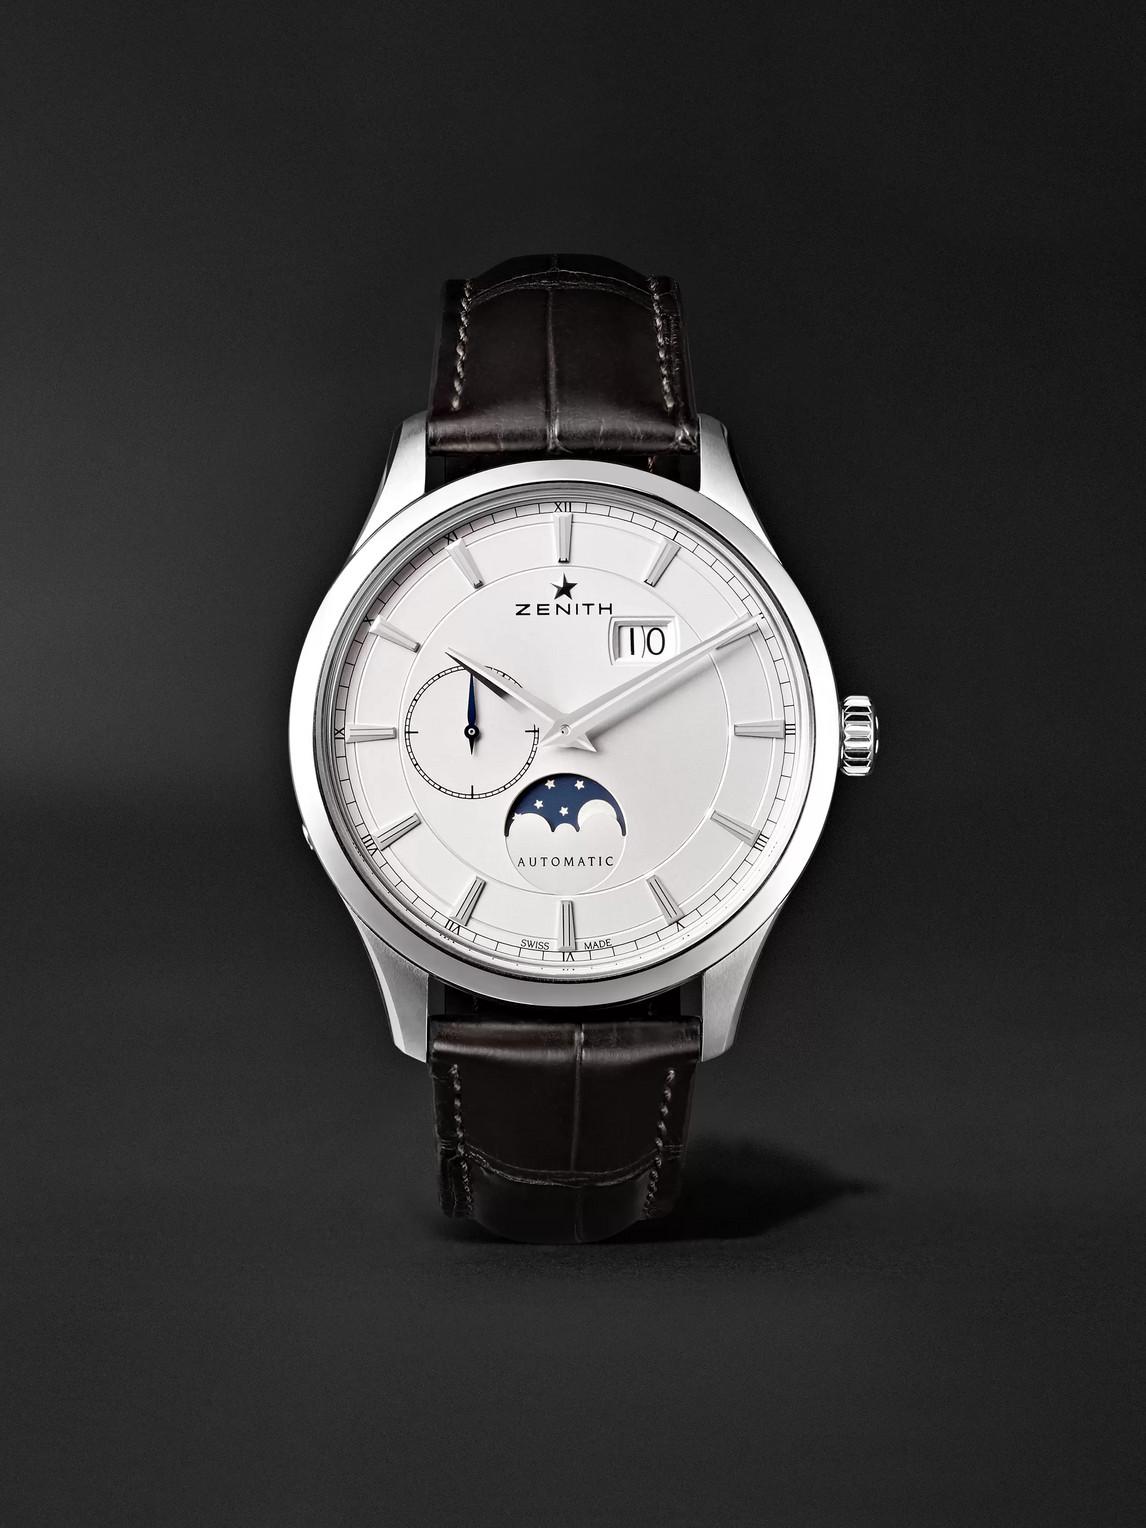 Zenith Elite Moonphase 40mm Stainless Steel And Alligator Watch, Ref. No. 03.2143.691/01.c498 In White